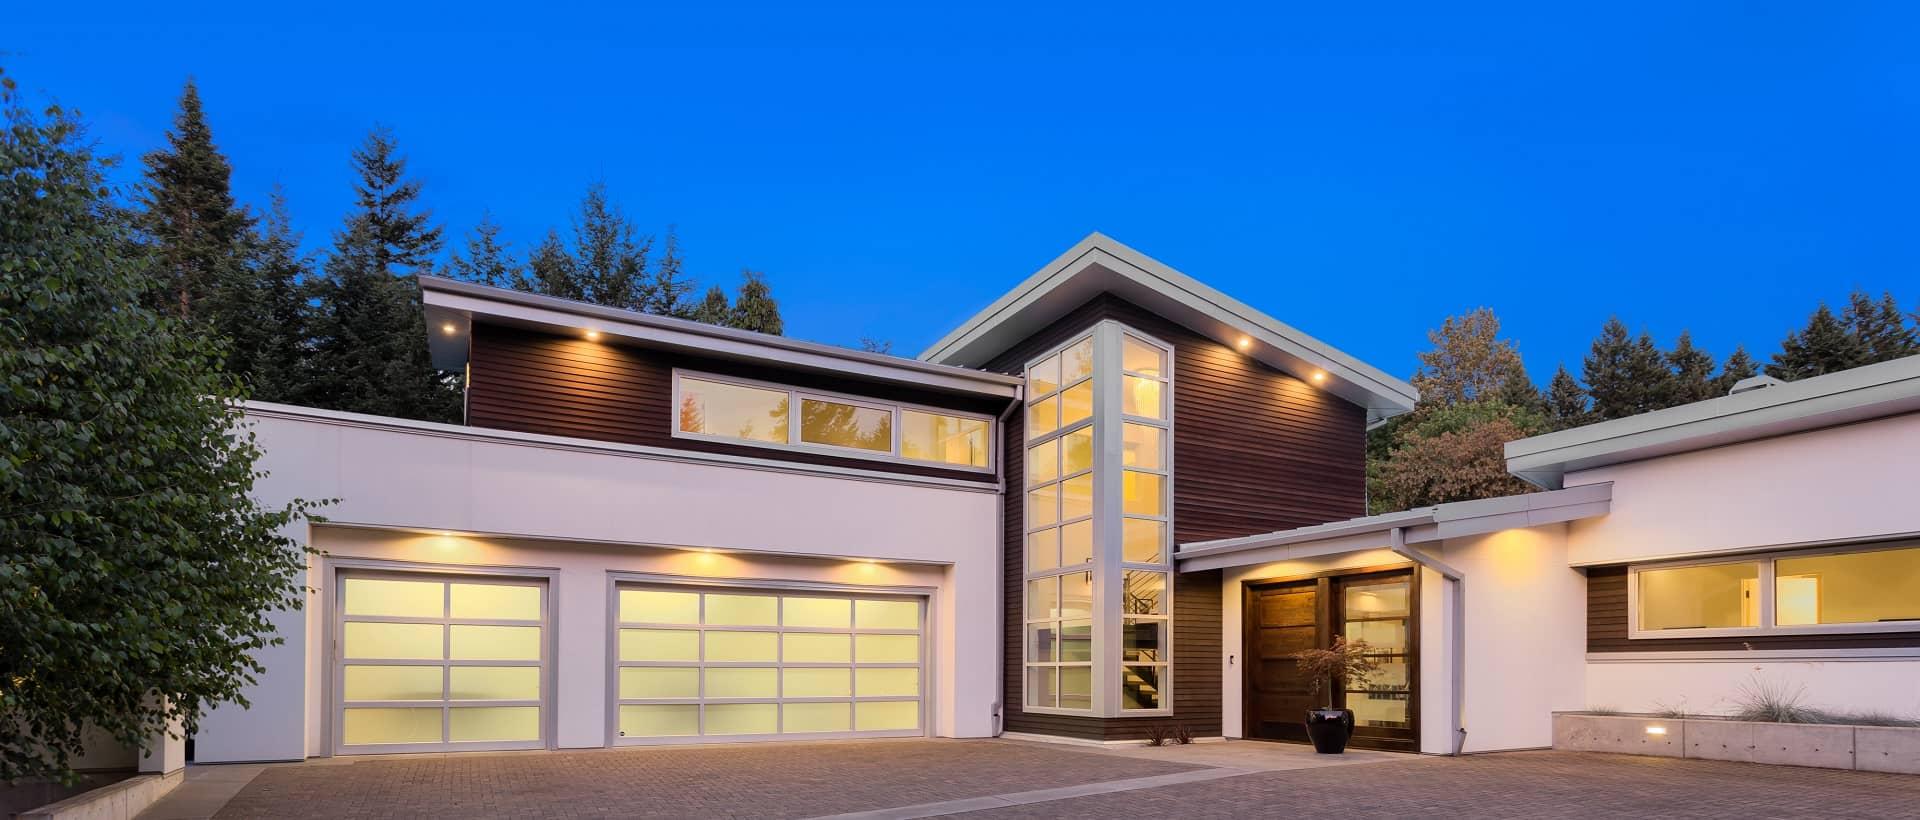 NOW Garage Doors & Locksmith Services